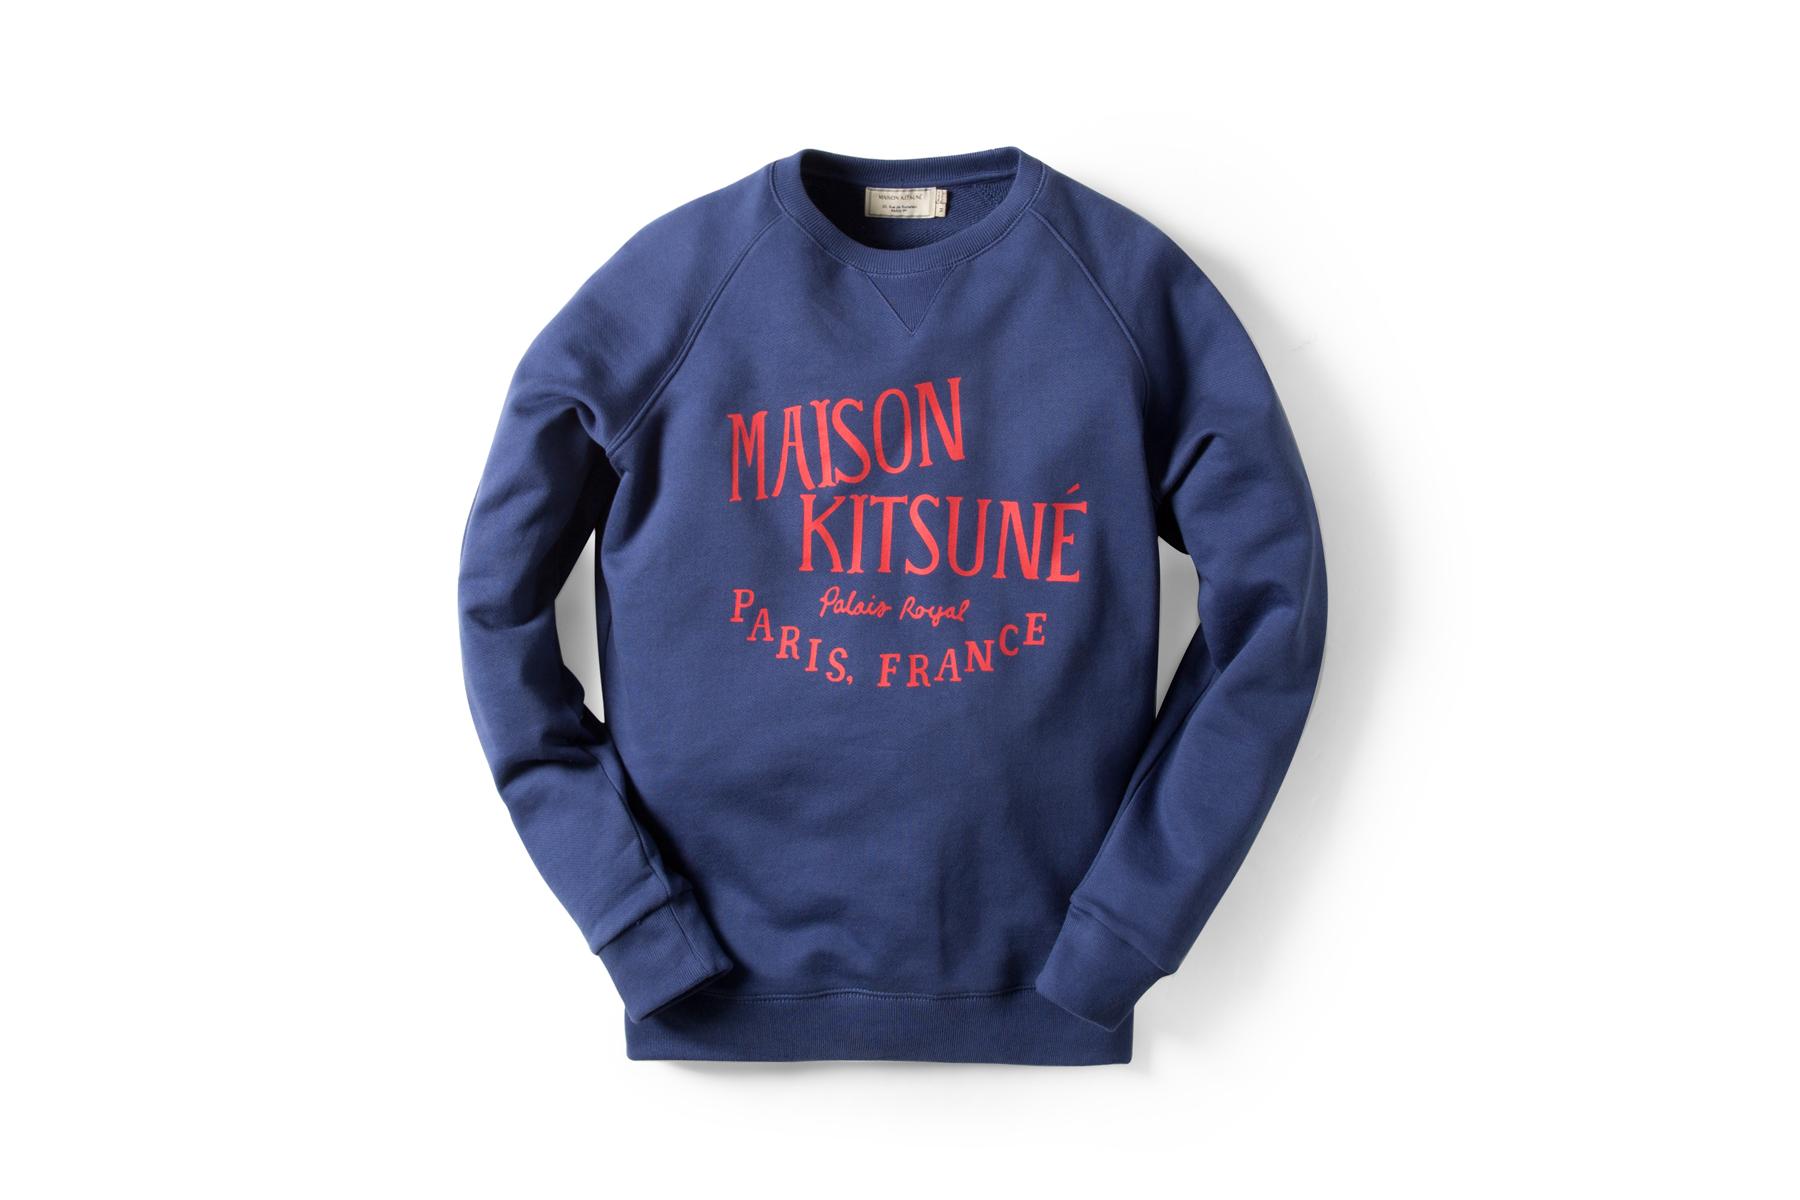 Reebok x Maison Kitsune Capsule Menswear Collection